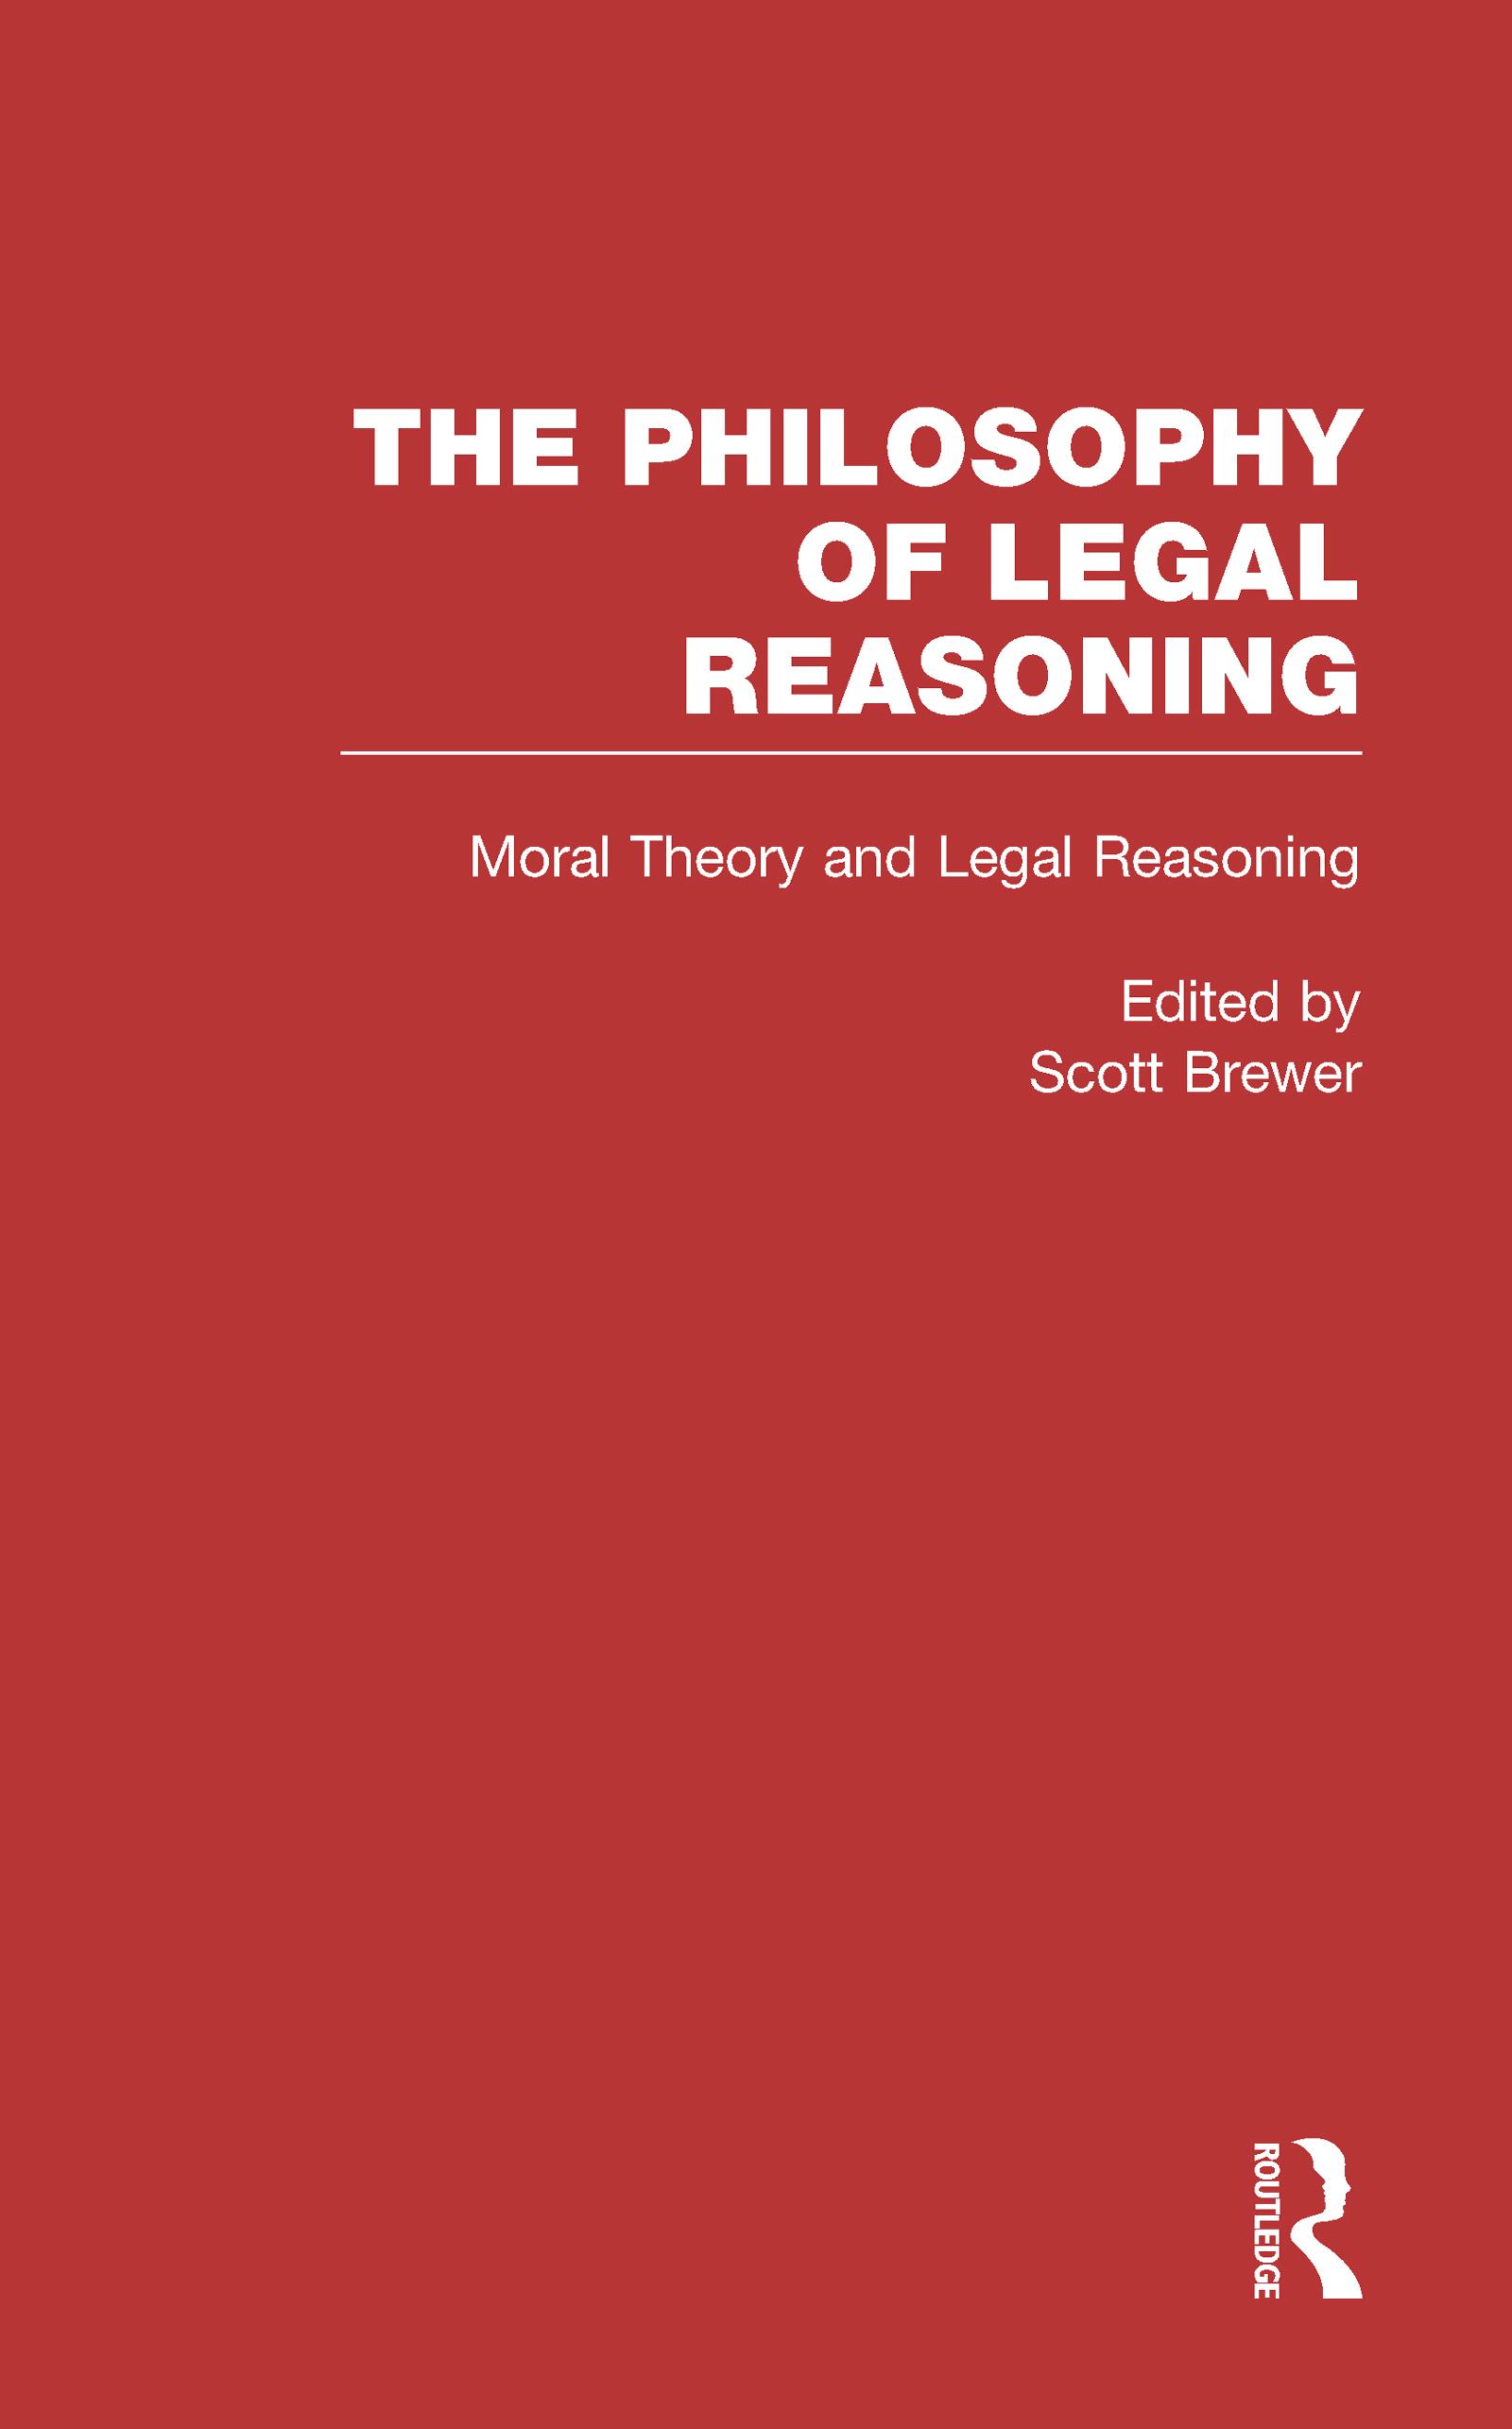 Moral Theory and Legal Reasoning